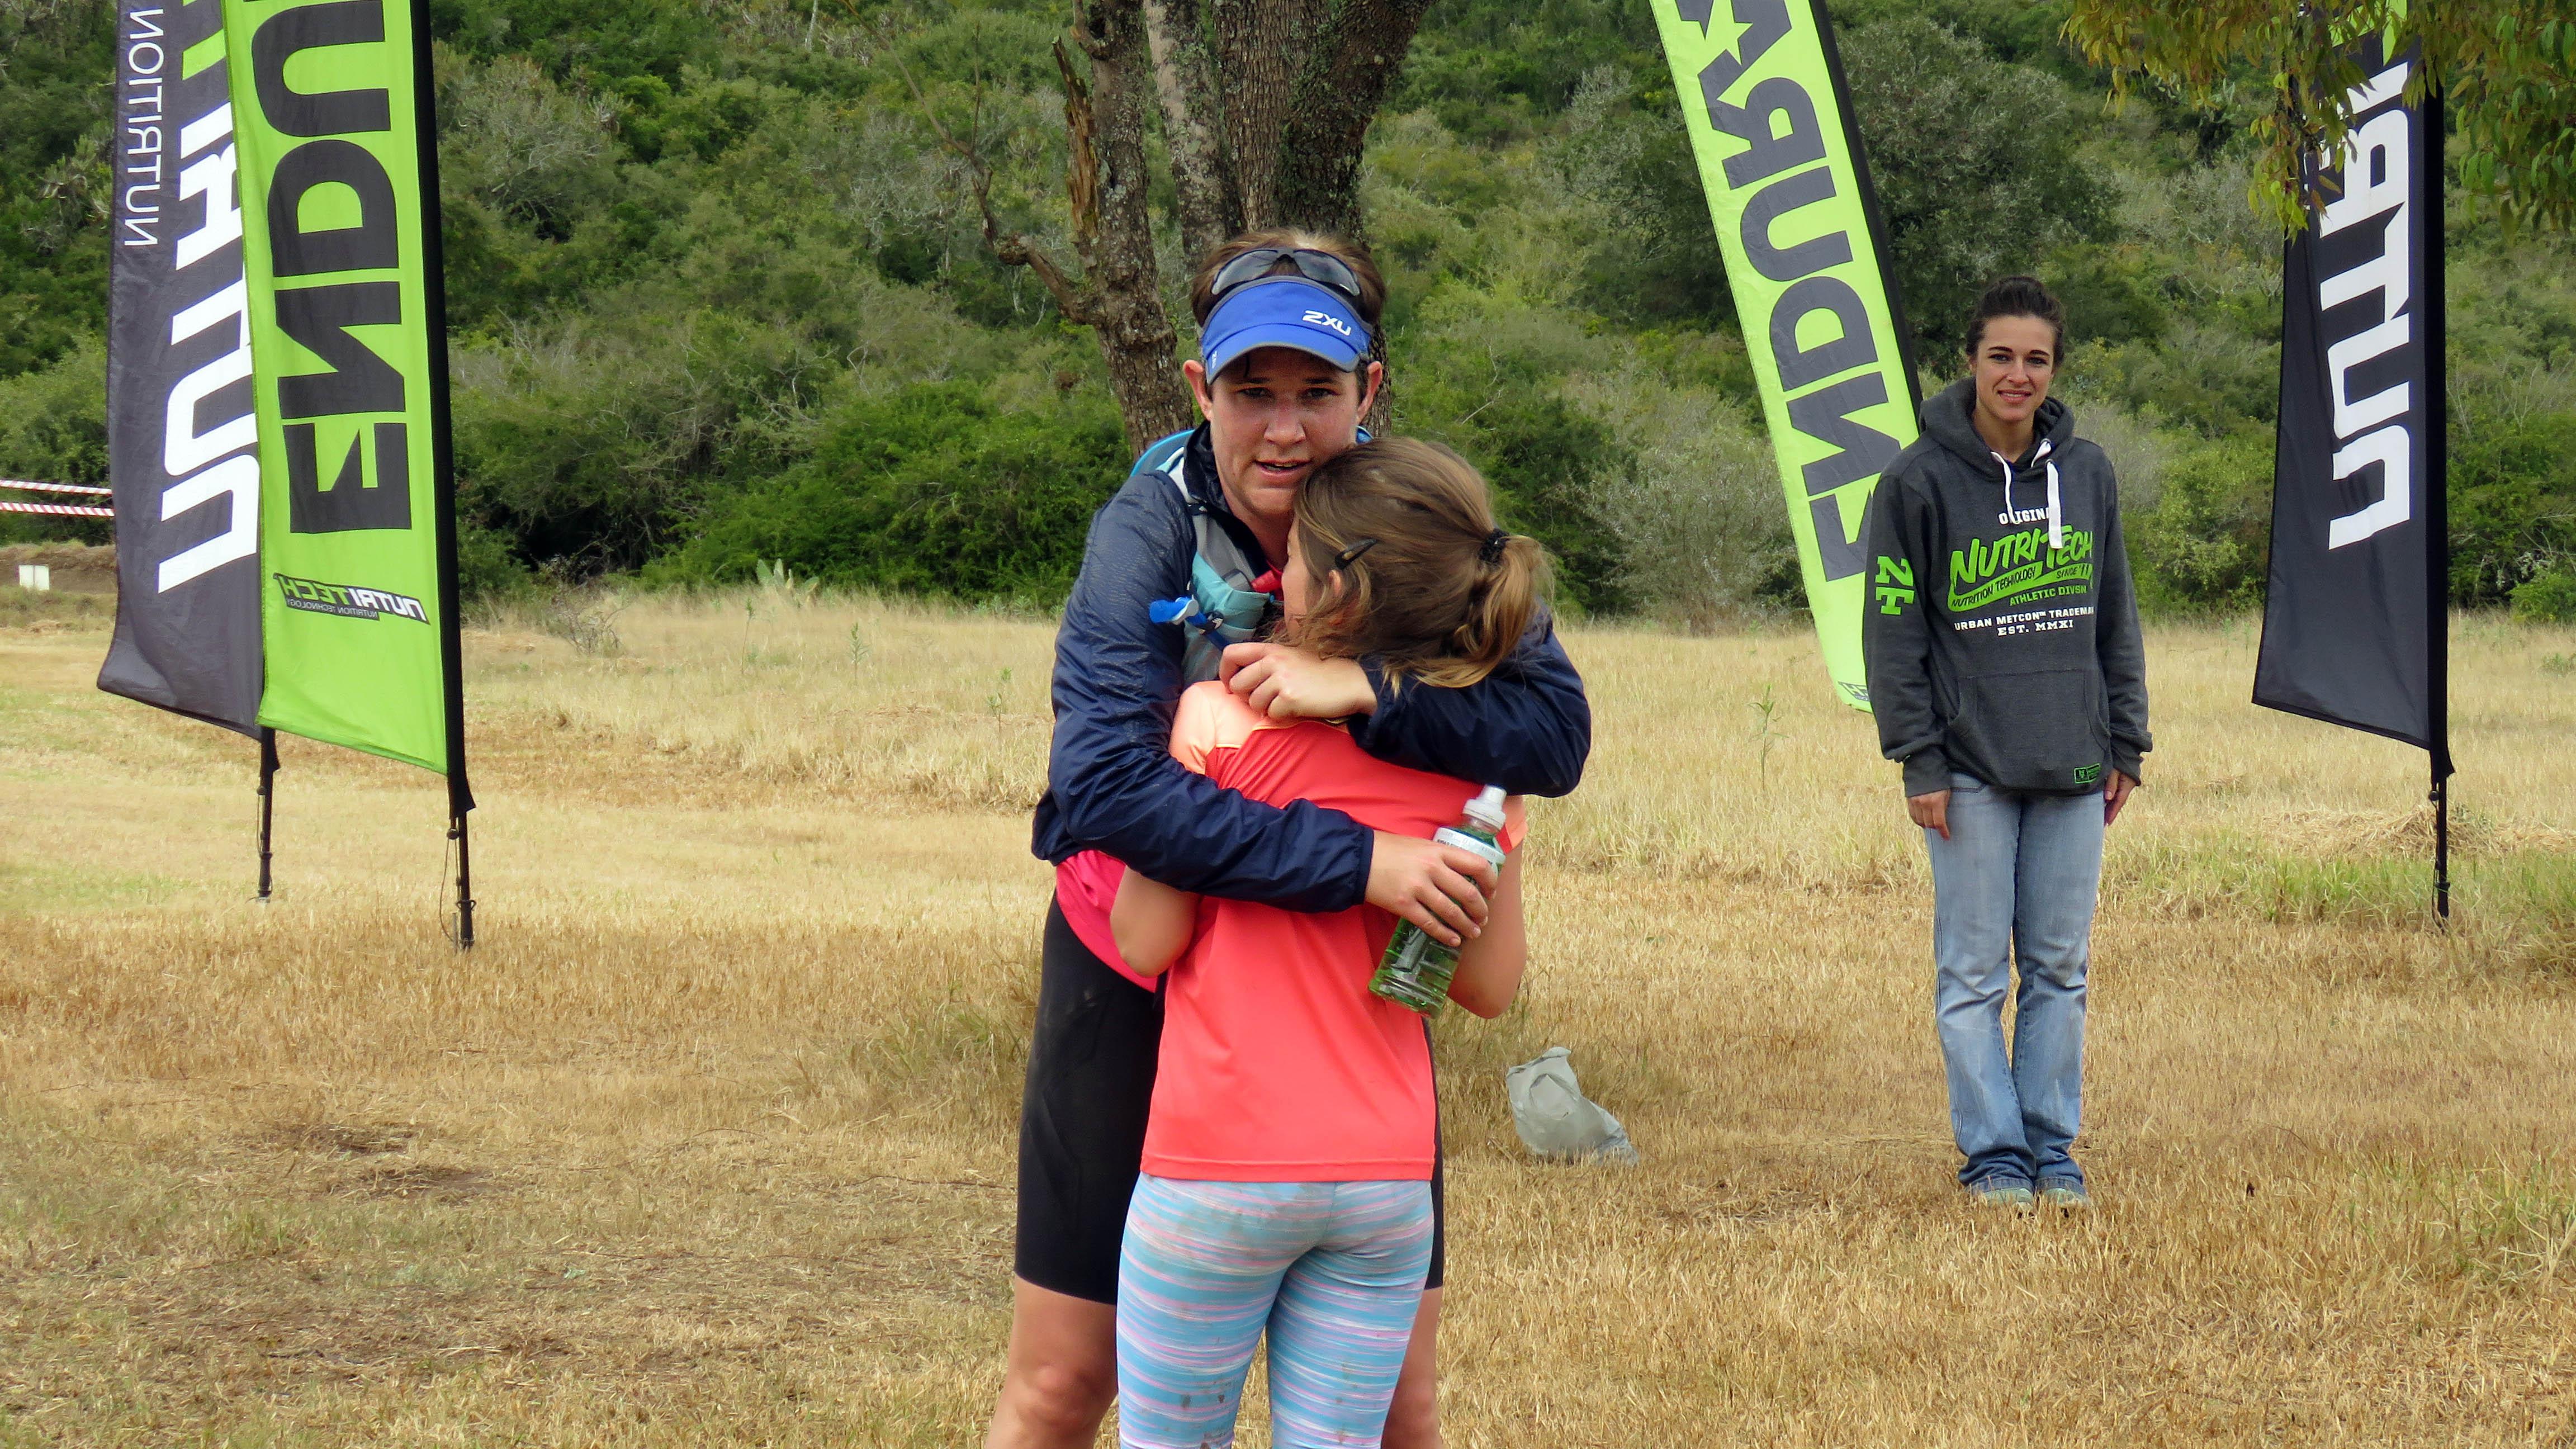 hayterdale trailrun 2018-08-05  (121)